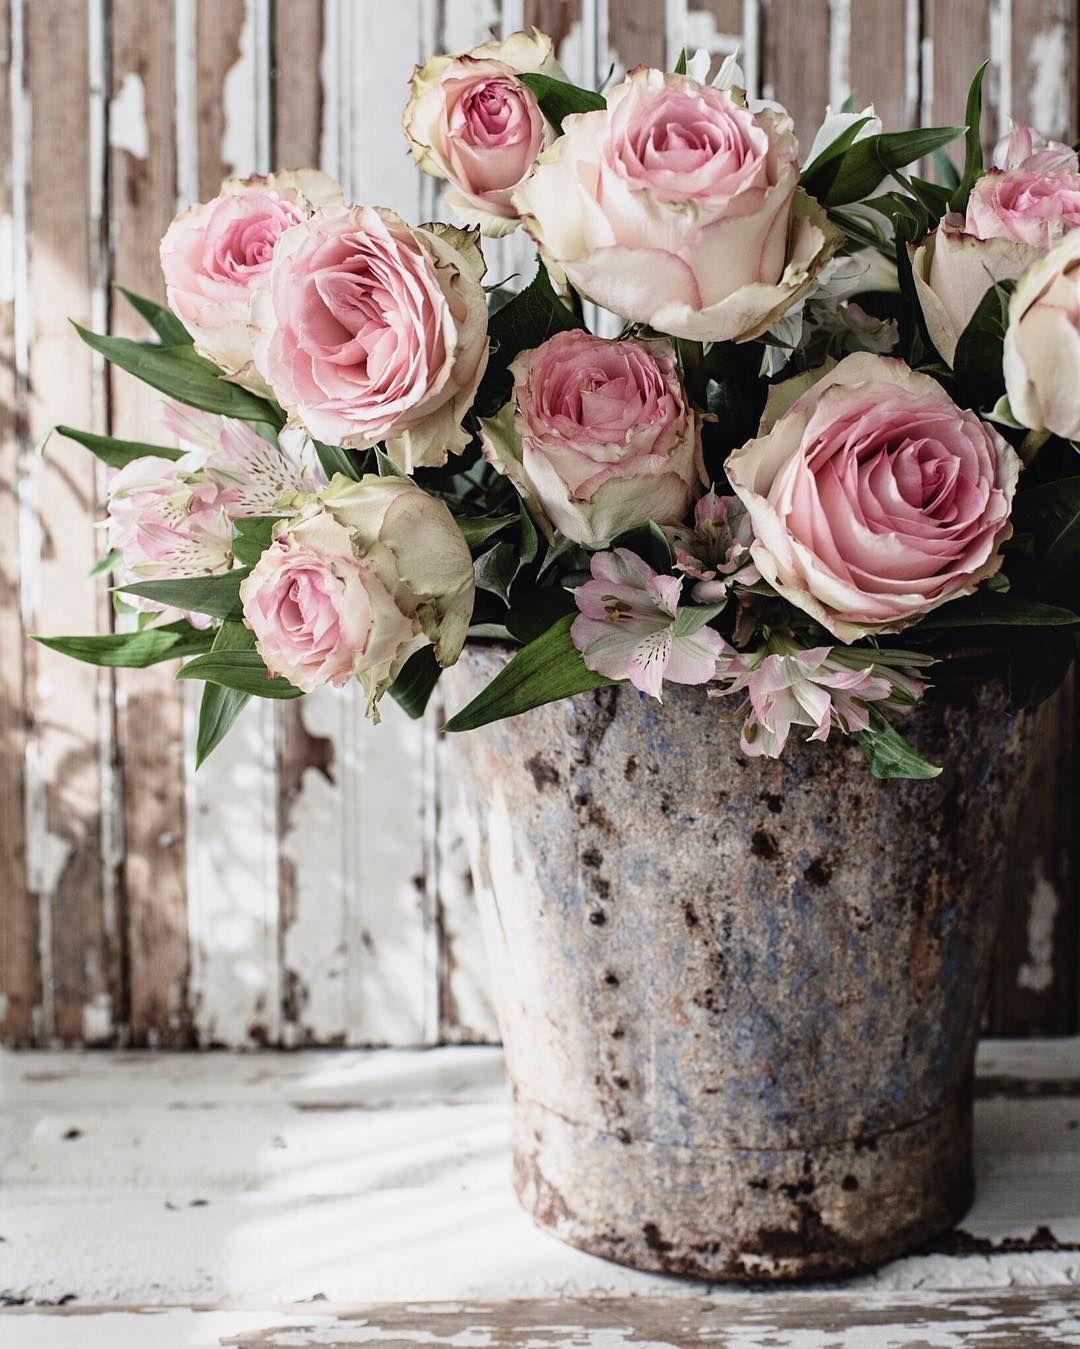 Home Remodel Windows In 2020 Beautiful Flowers Beautiful Pink